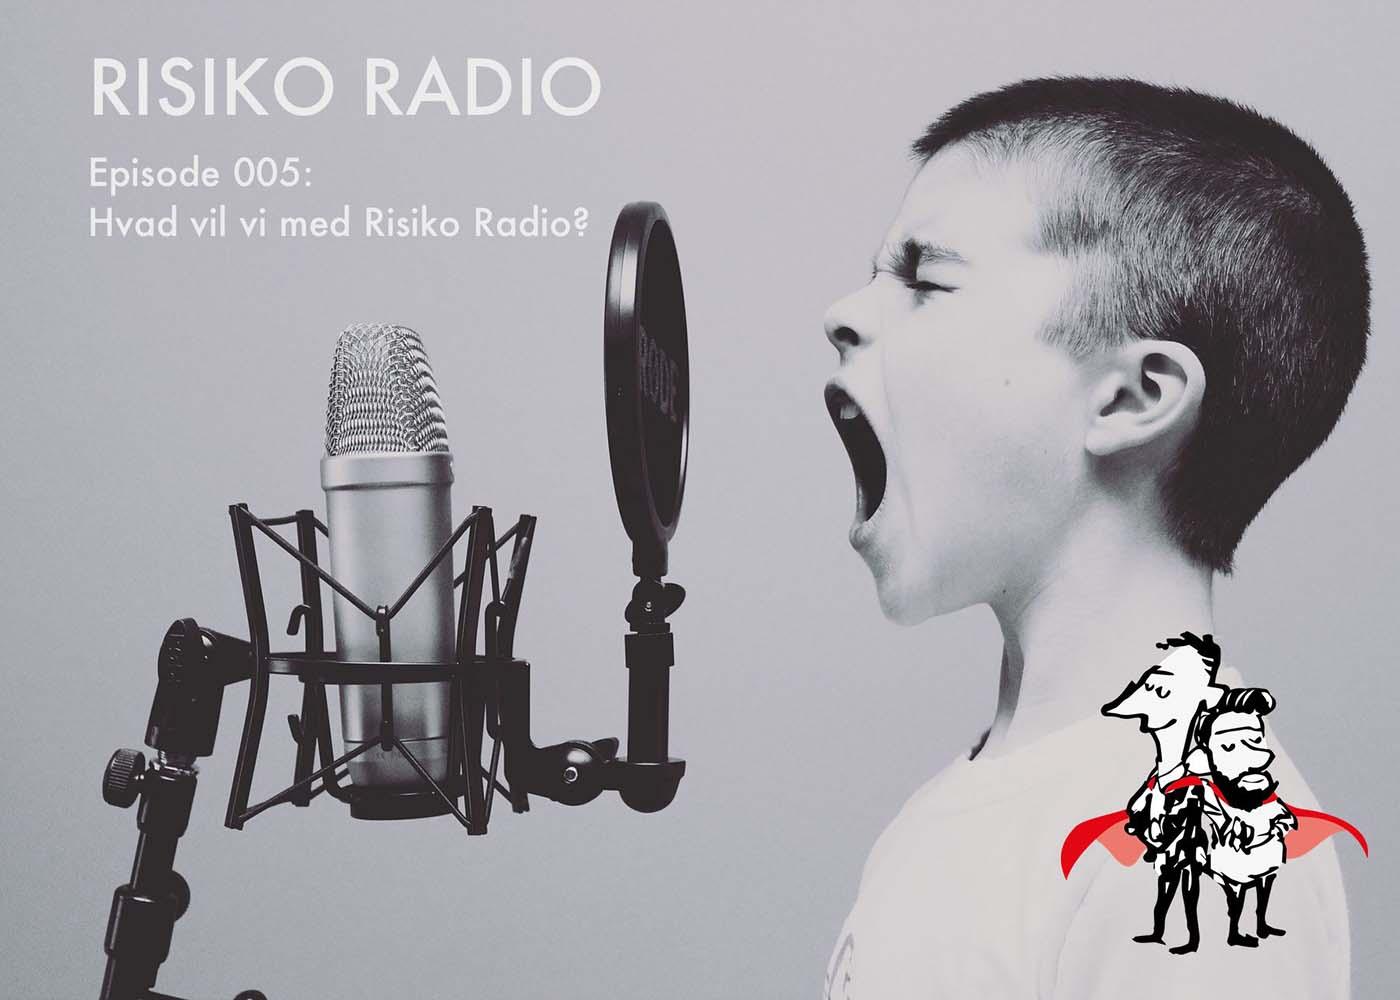 Risiko radio